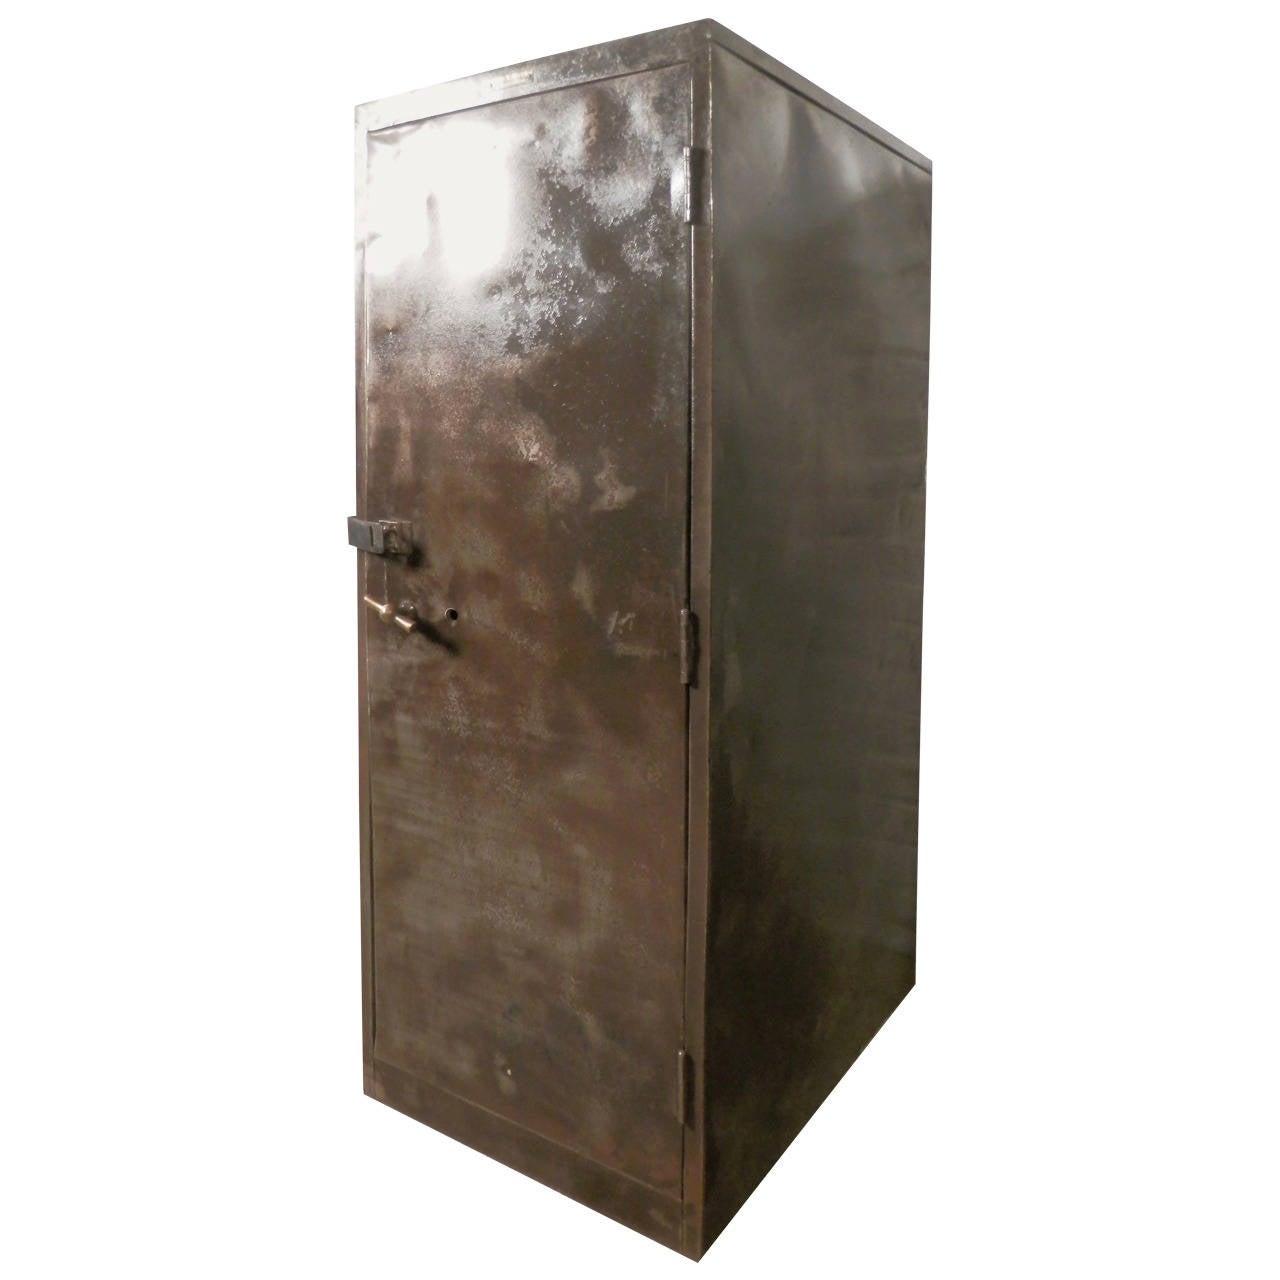 Large Industrial Metal Cabinet by Columbia Steel